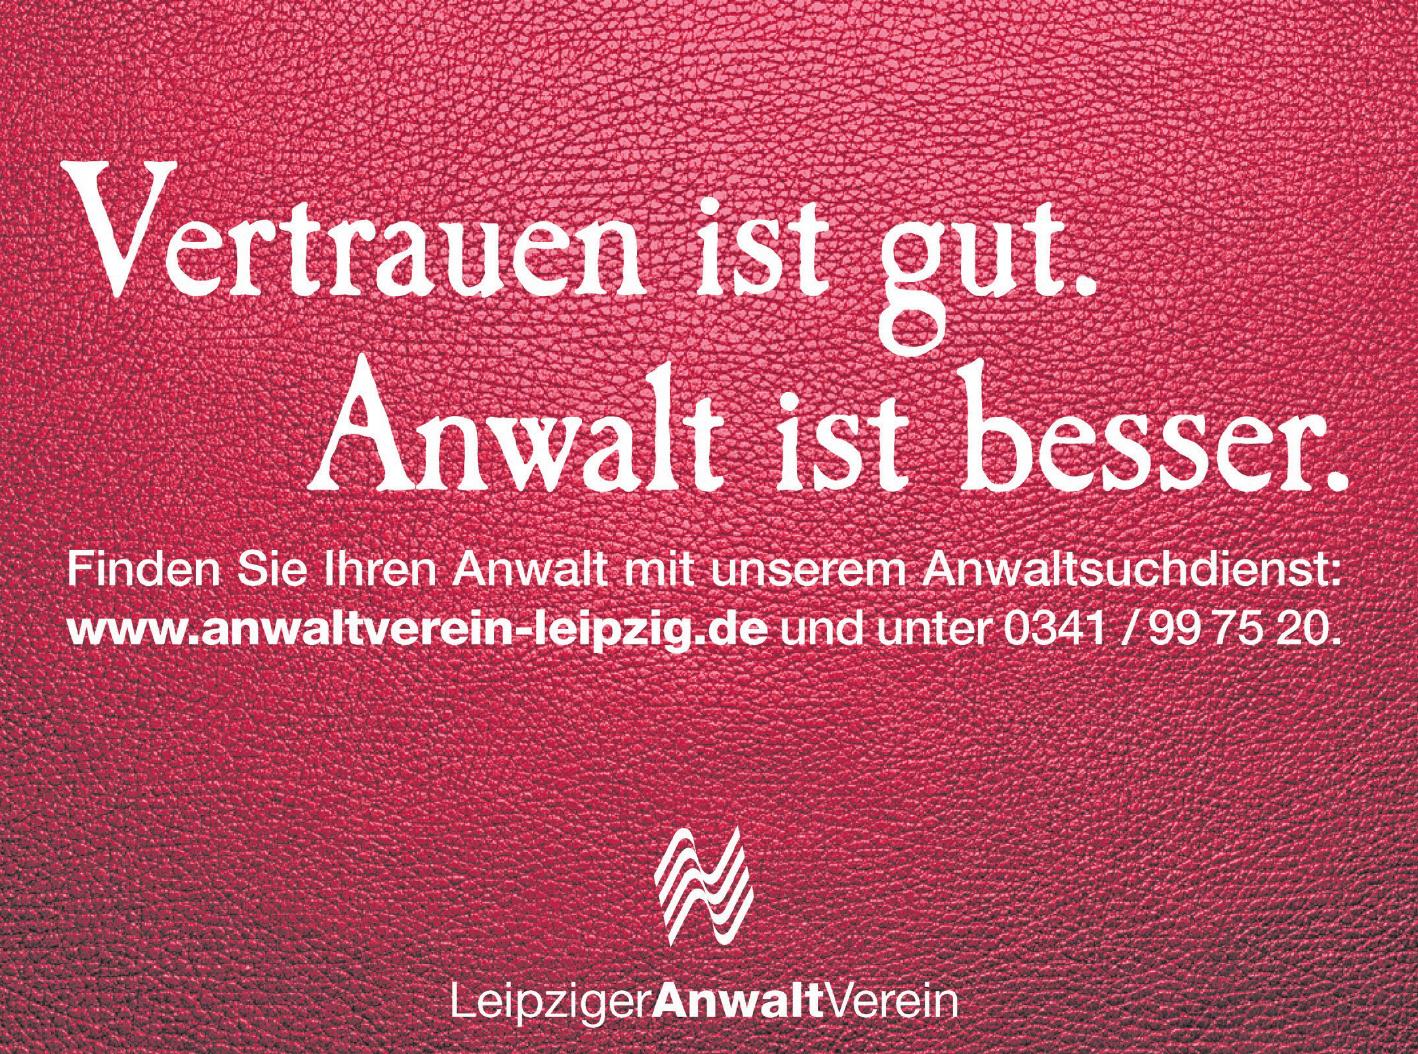 Leipziger Anwaltverein